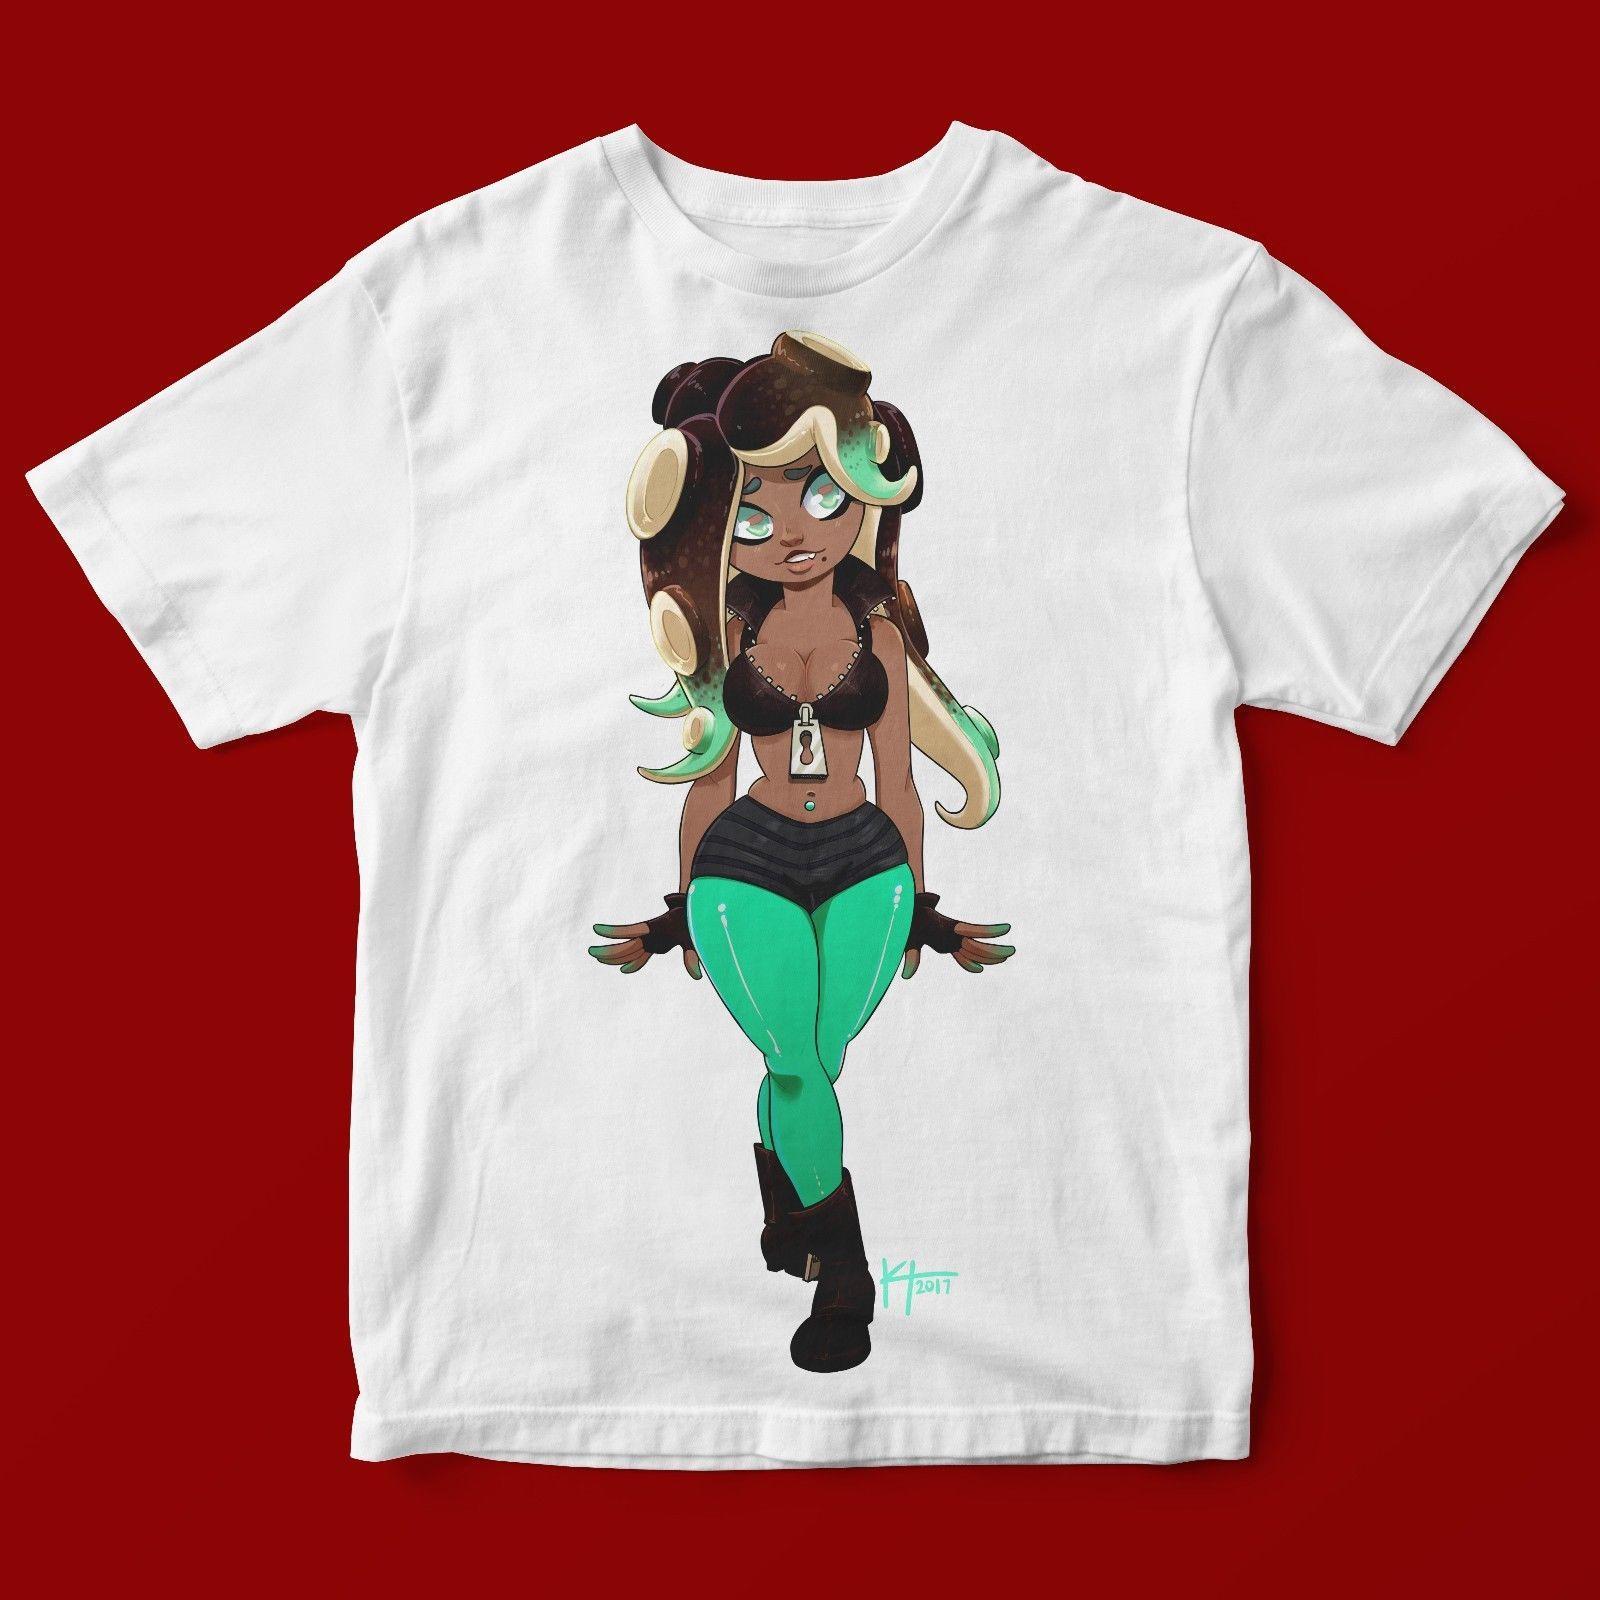 c55500192 SEXY ANIME WOMAN T SHIRT UNISEX 801 Best T Shirt Shop Online Cool T Shirt  Online From Goodservice74, $11.17| DHgate.Com